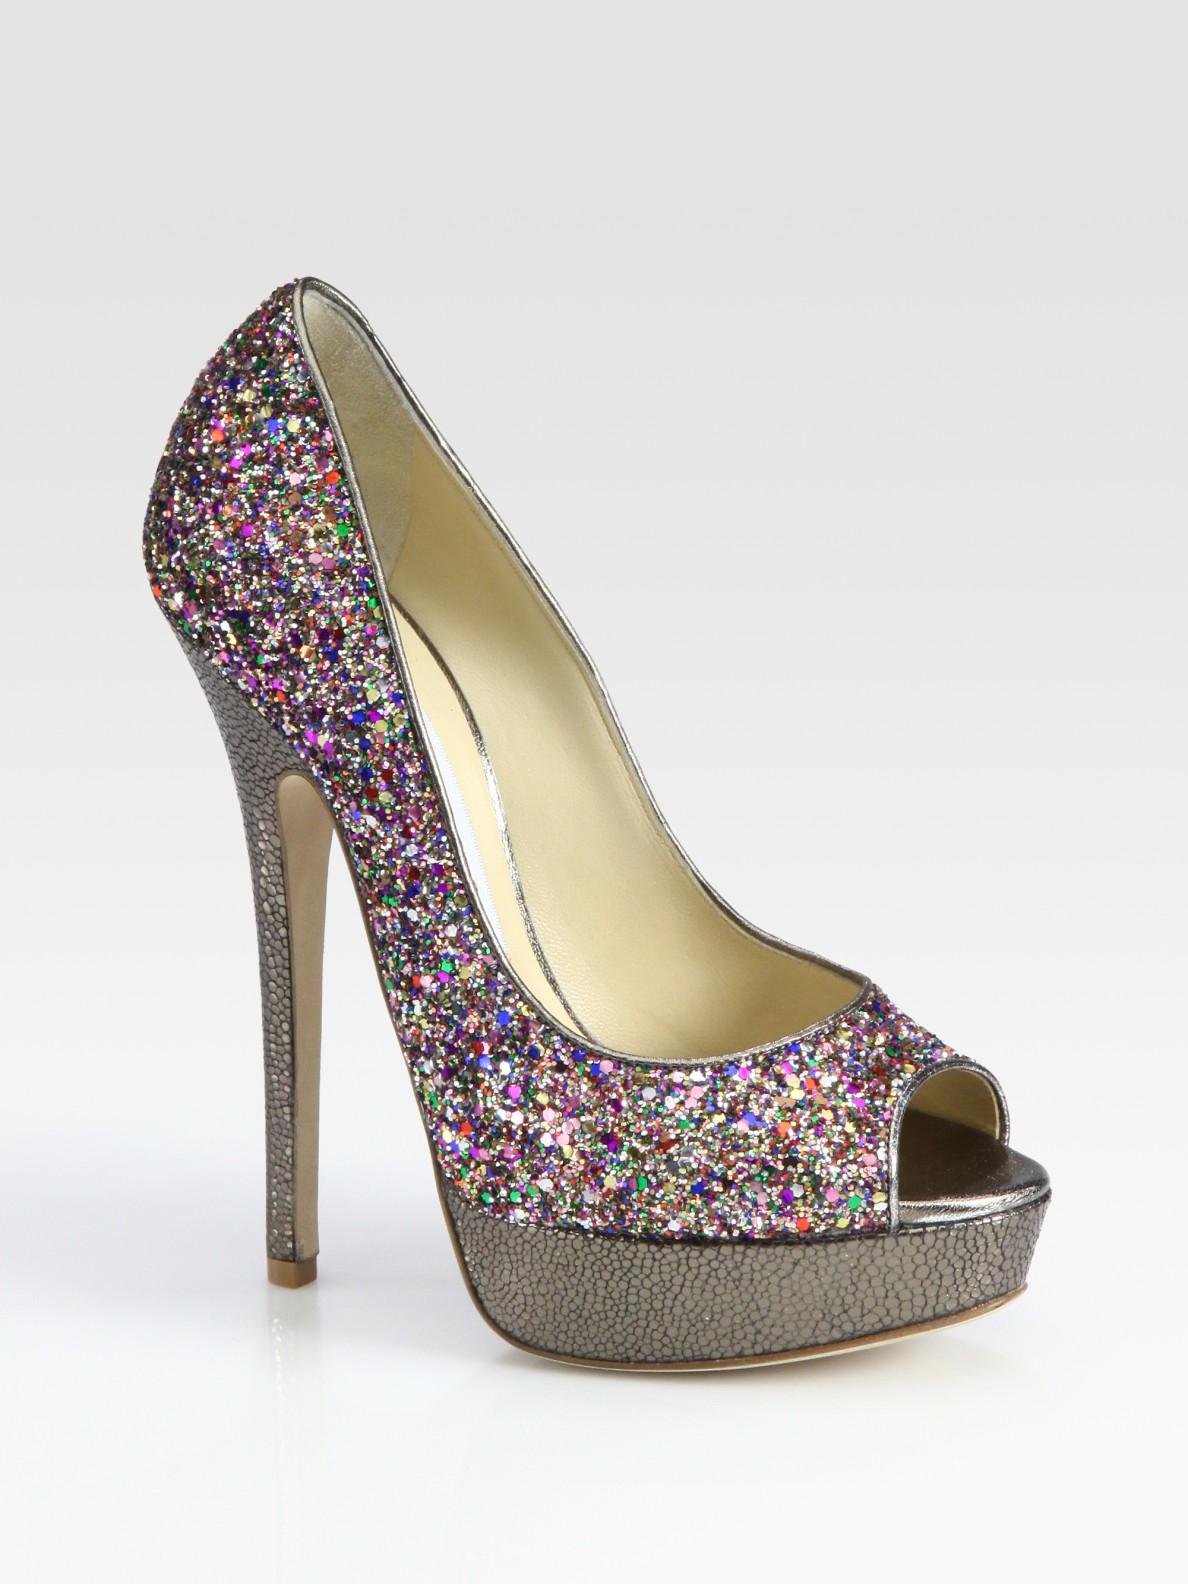 910efeca1a92 Lyst - Jimmy Choo Vibe Glitter-coated Leather Peep Toe Pumps in Purple